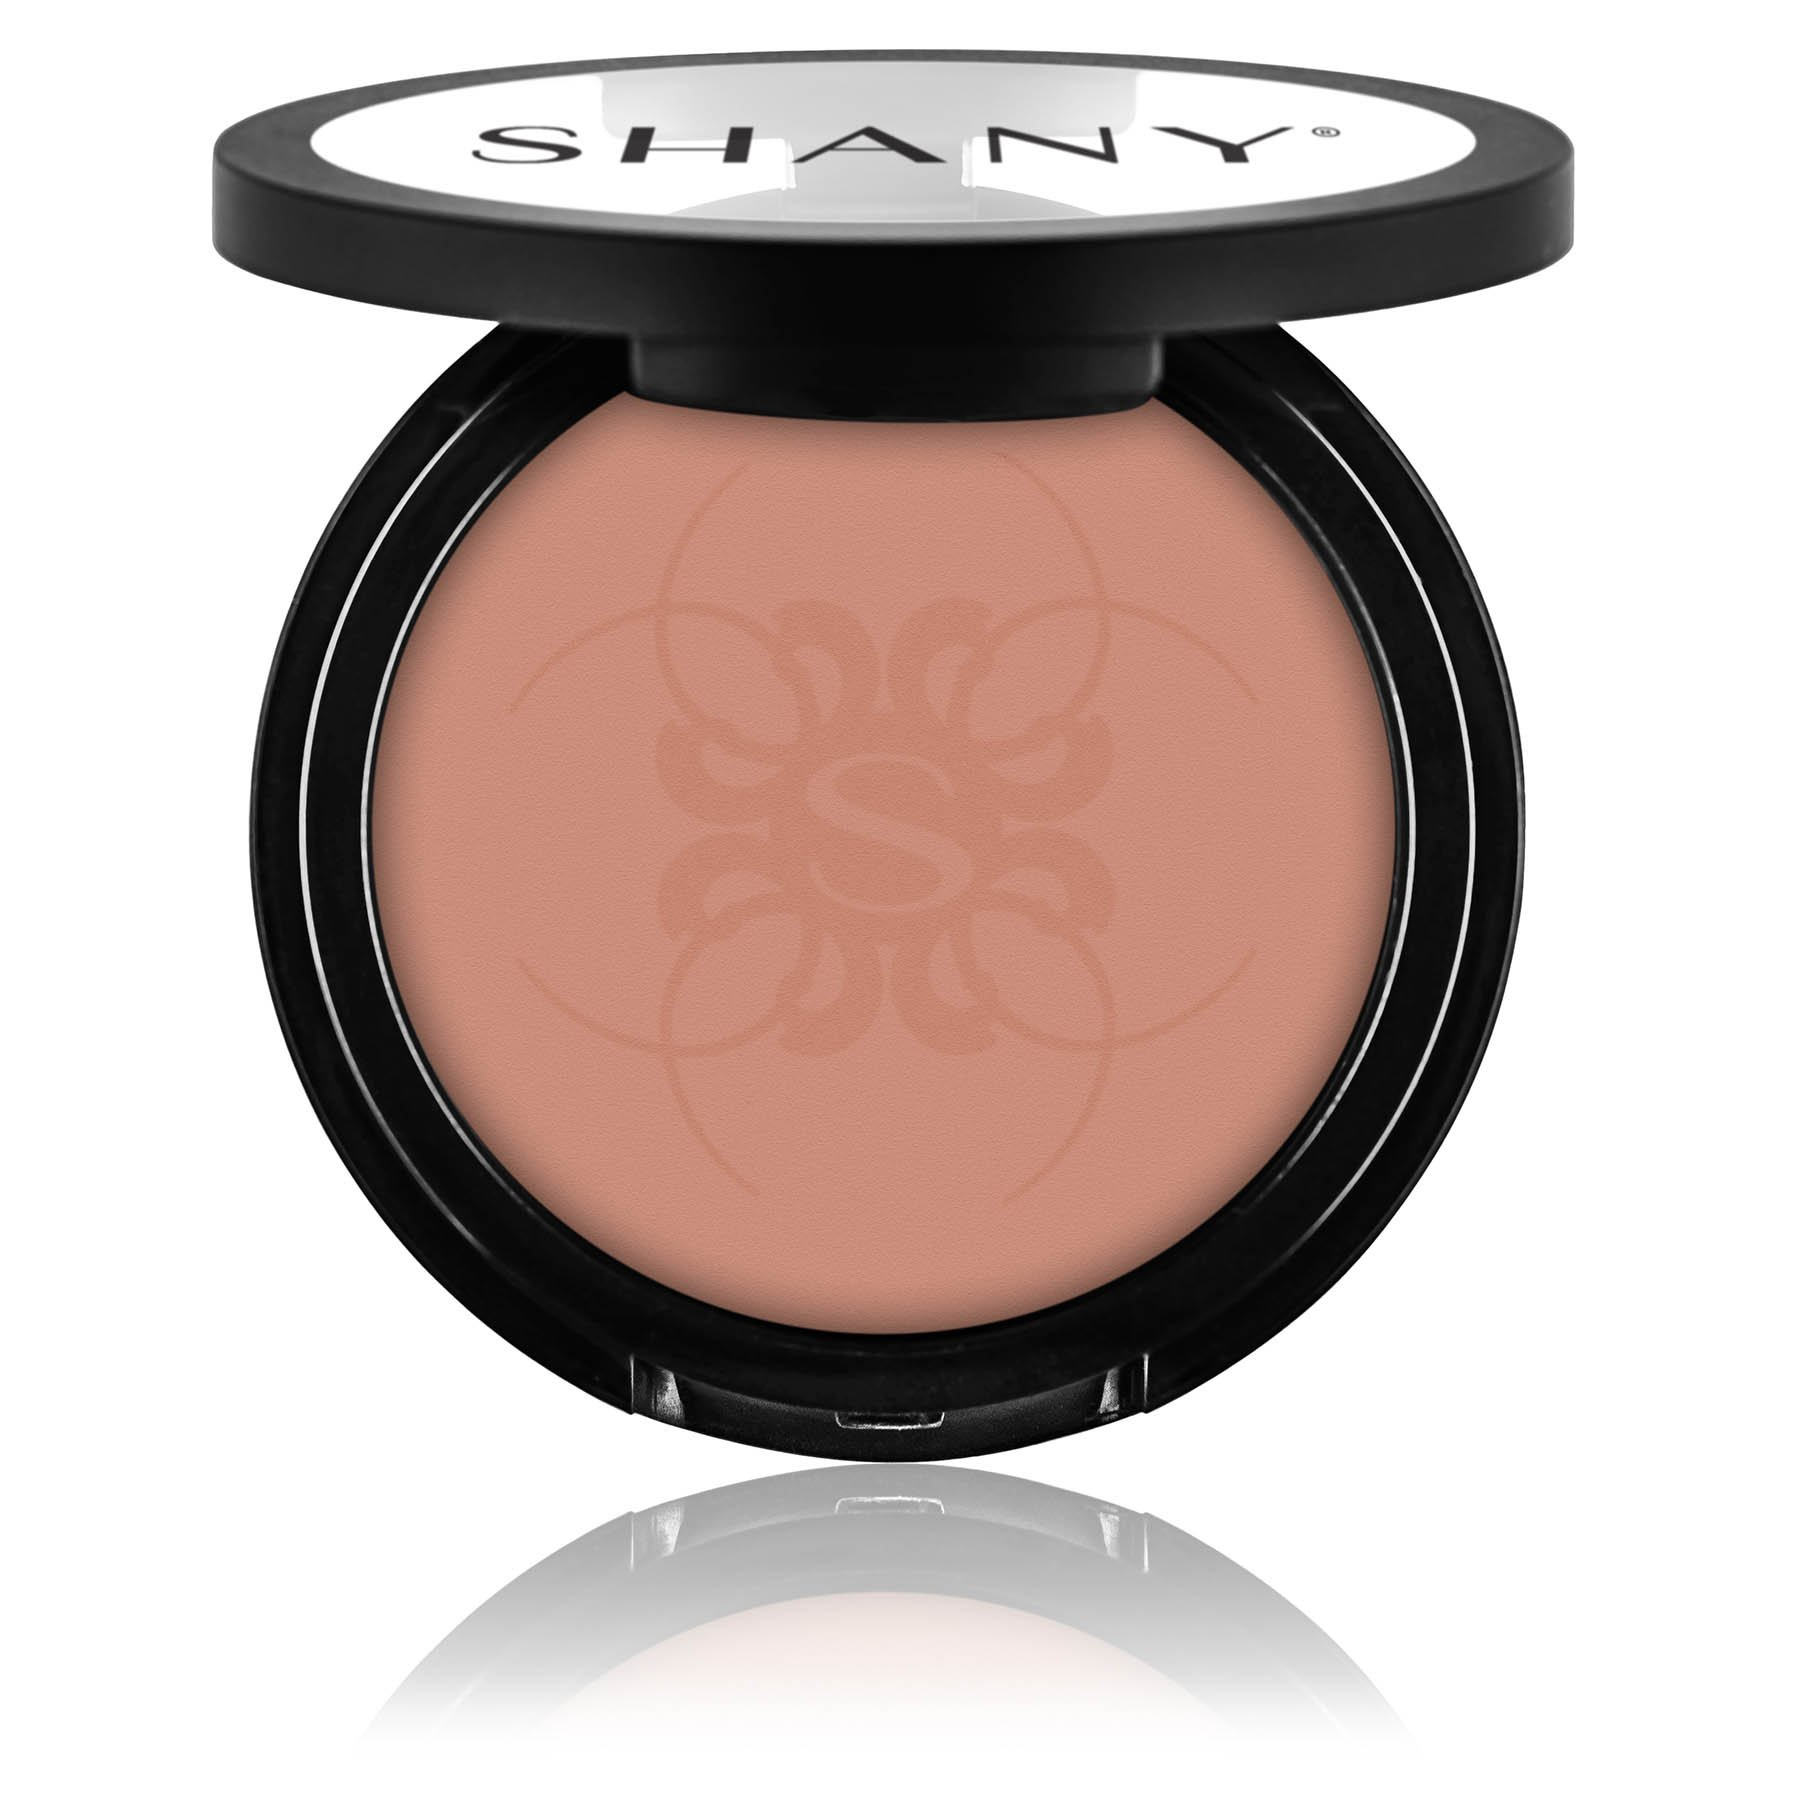 SHANY Paraben Free Powder Blush - VIGOROUS